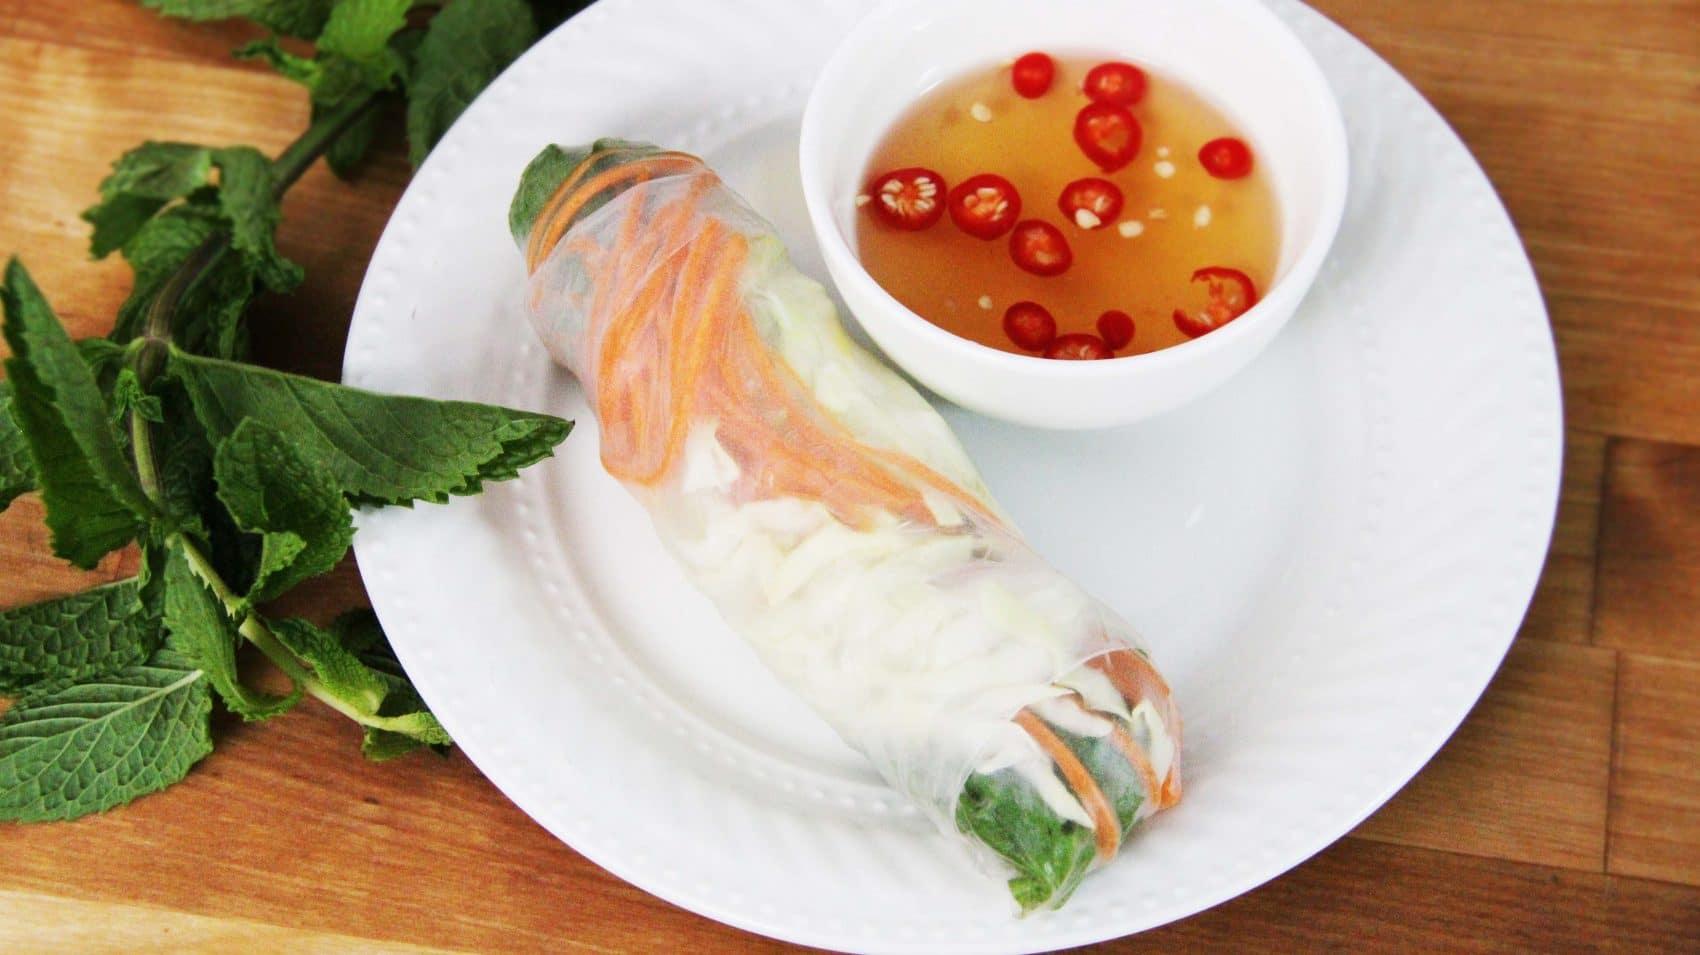 https://www.smseafoodmarket.com/lobster-summer-rolls/